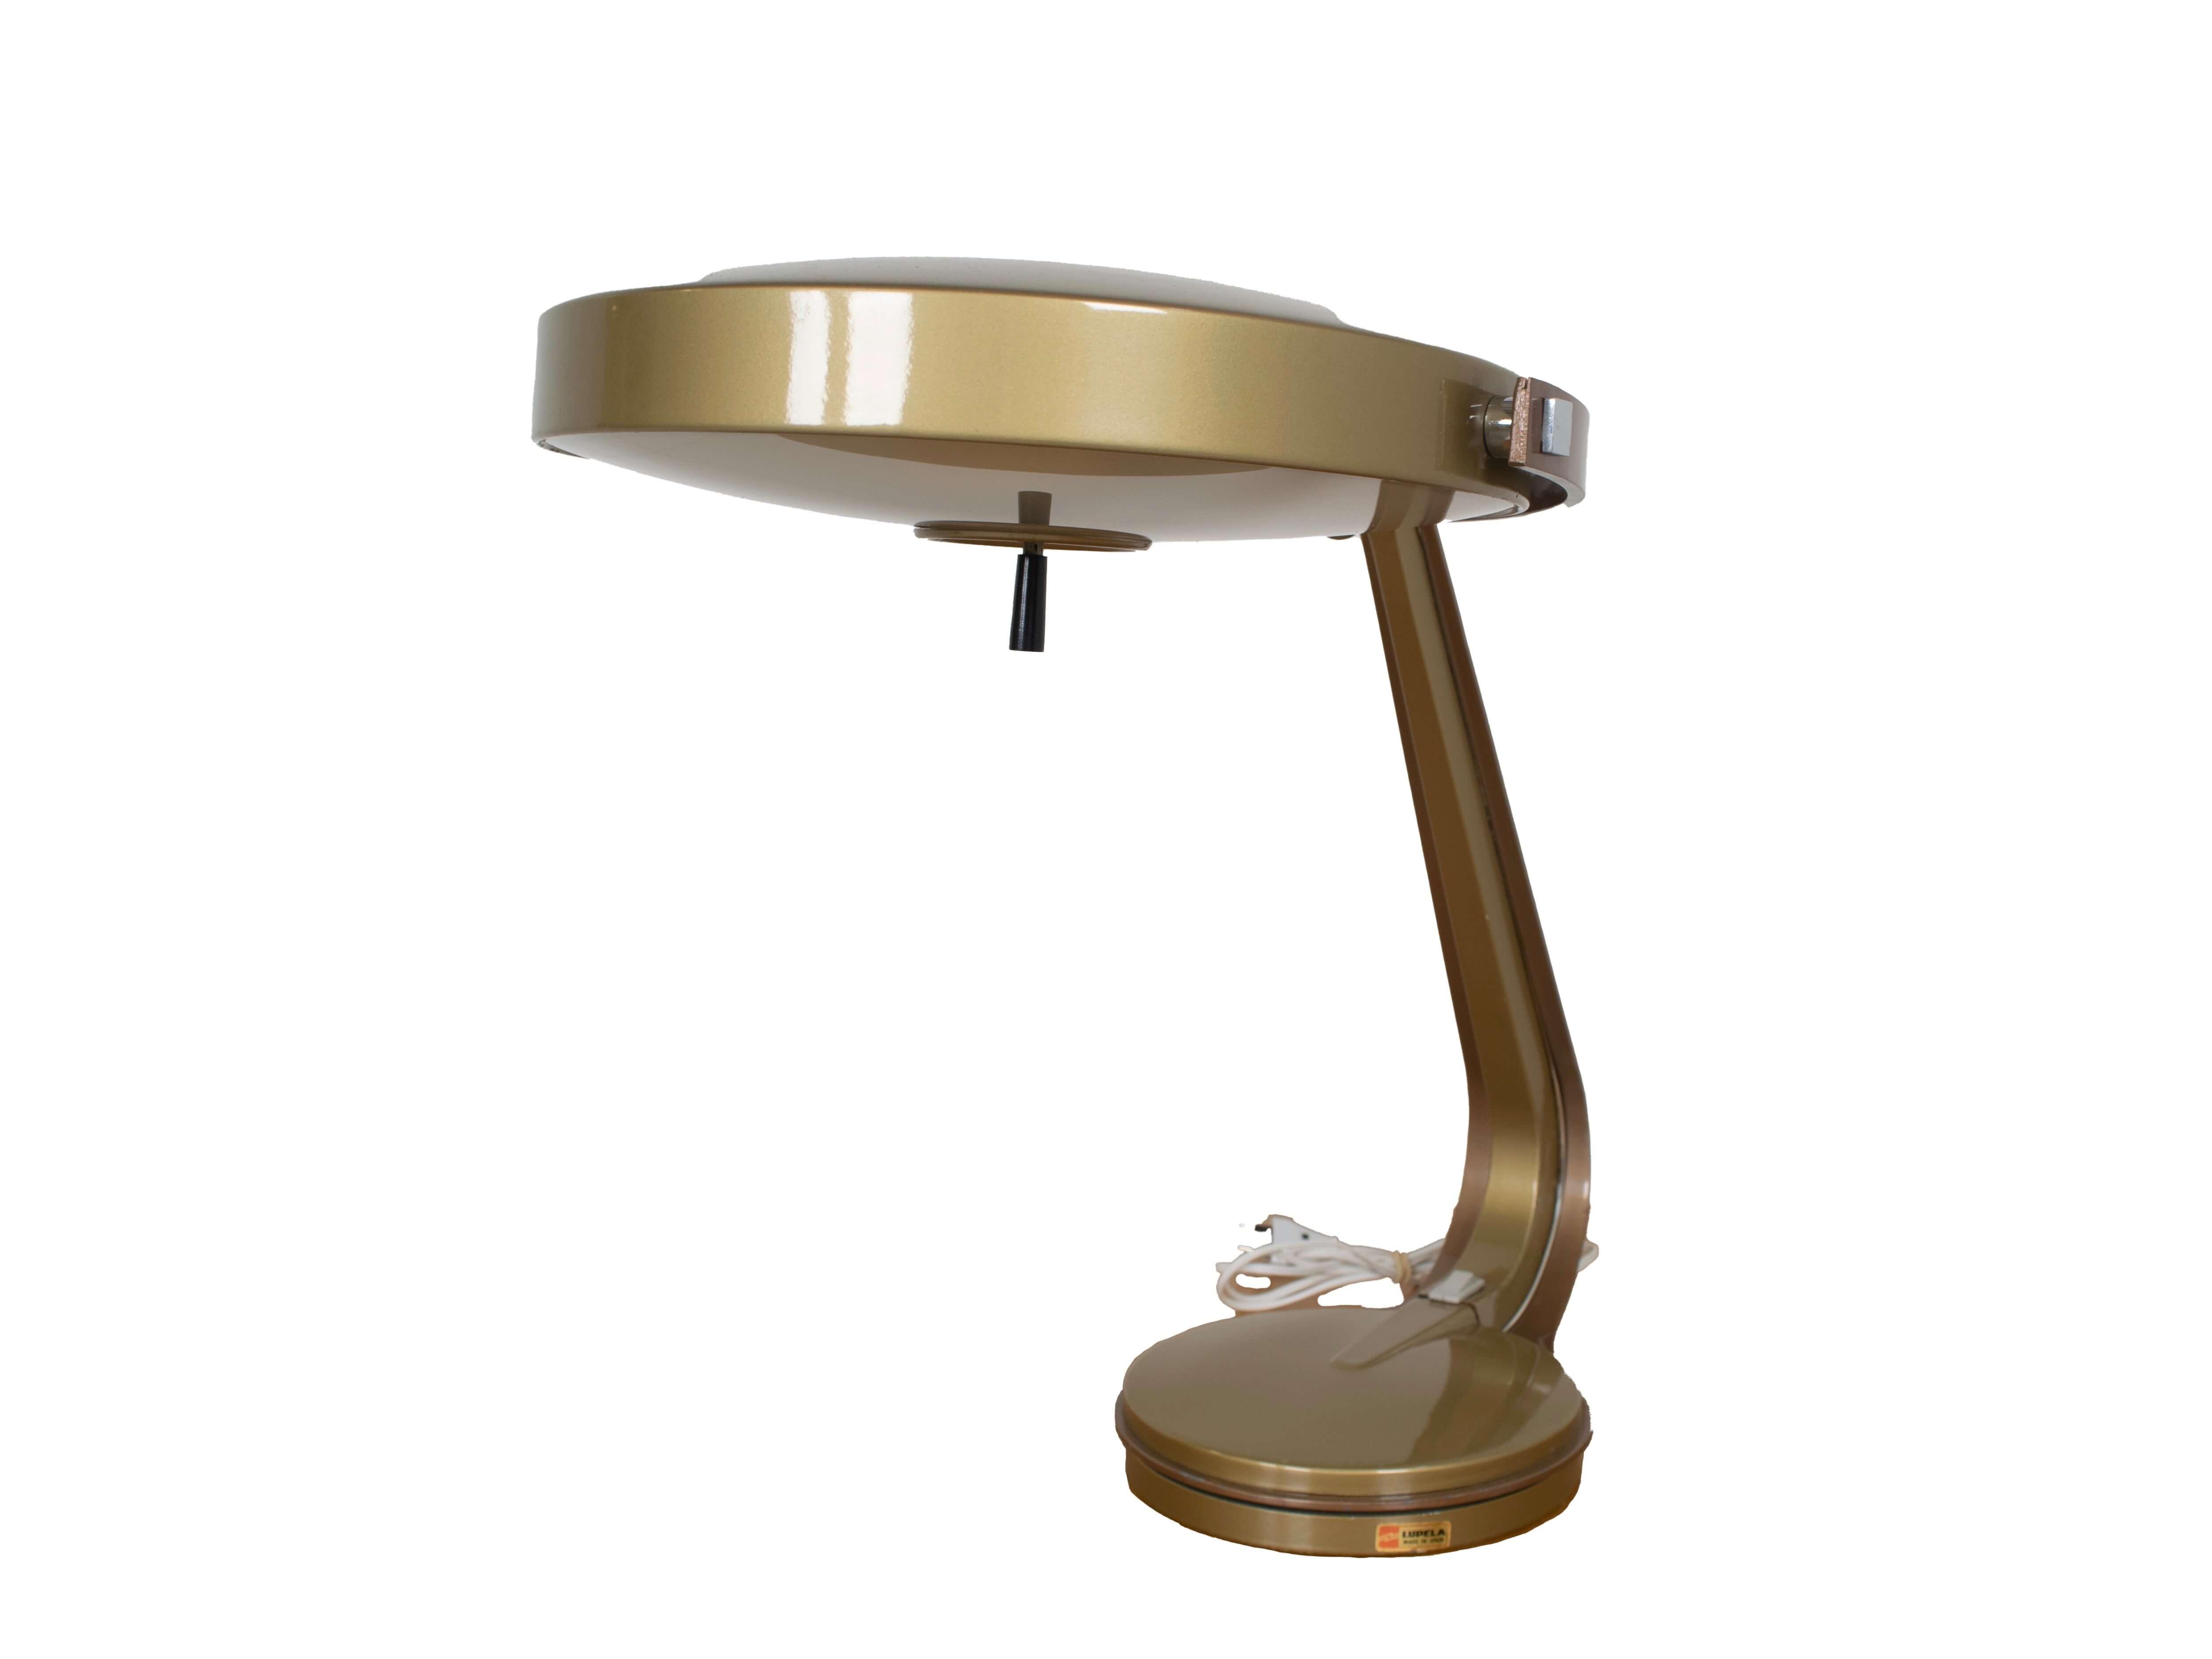 Fase Madrid 'Lupela Rey' Table Lamp, Spain 1960s